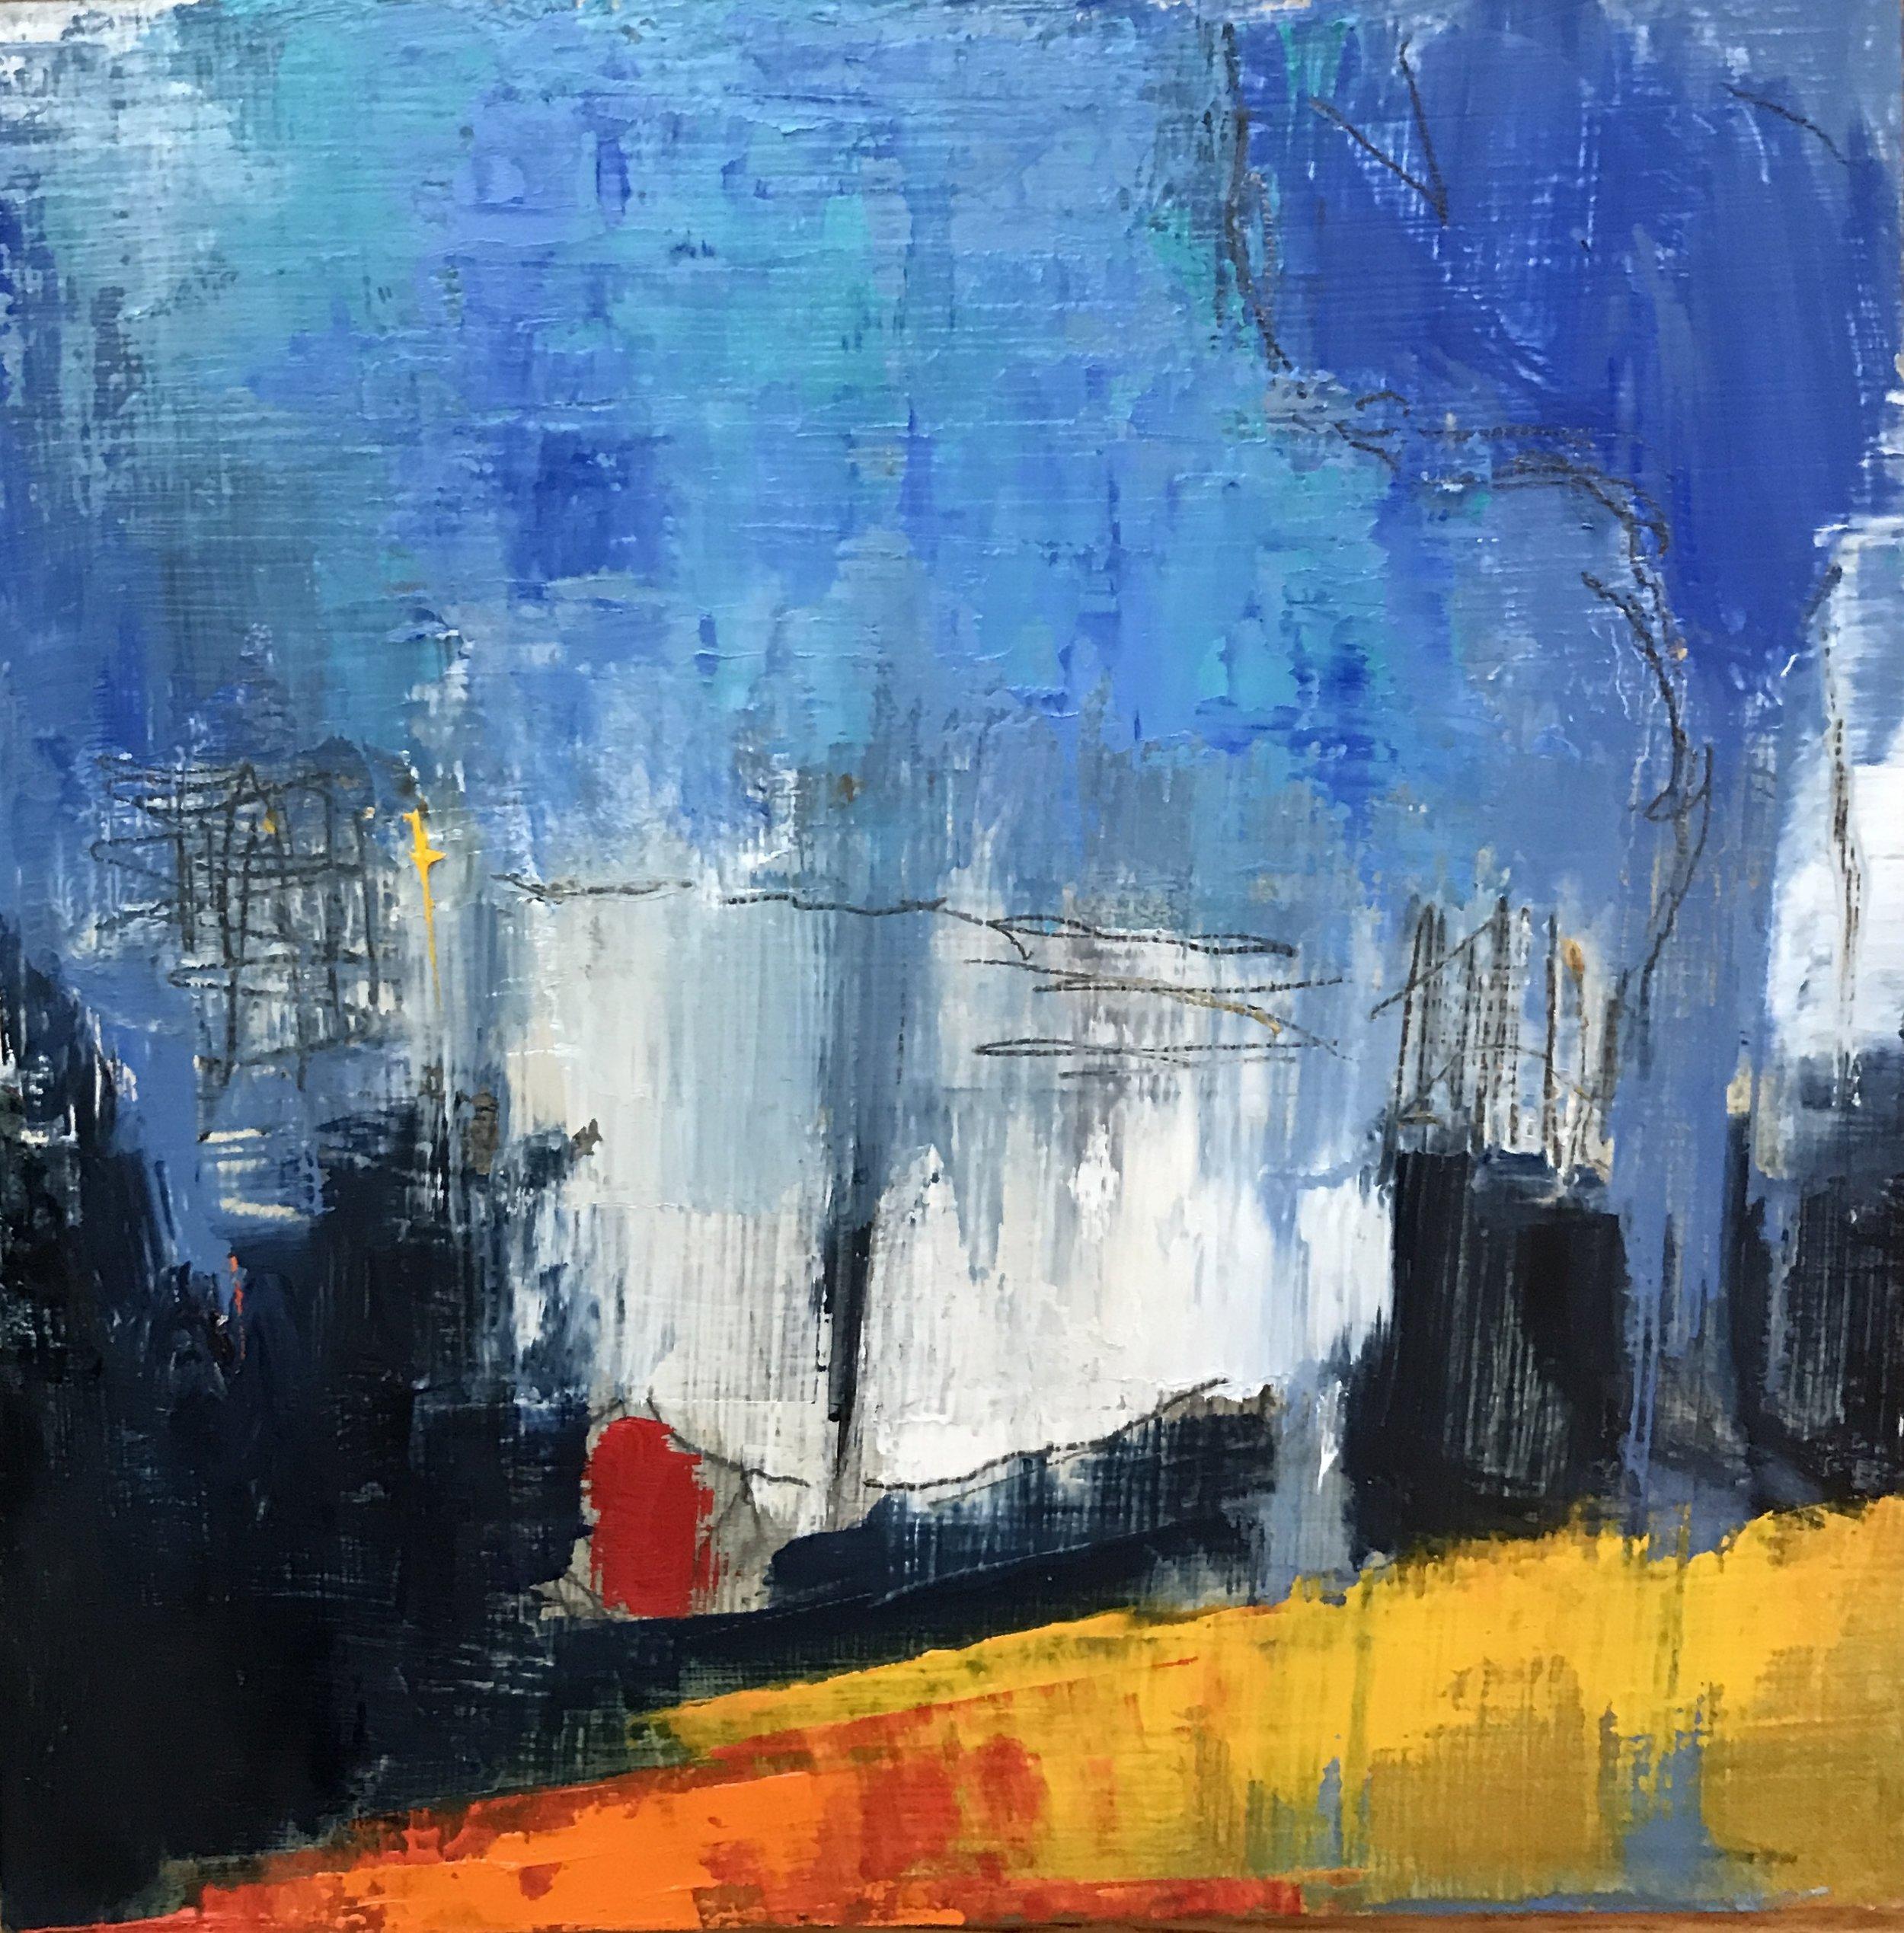 Beneath the Surface, Oil on Panel, 6x6